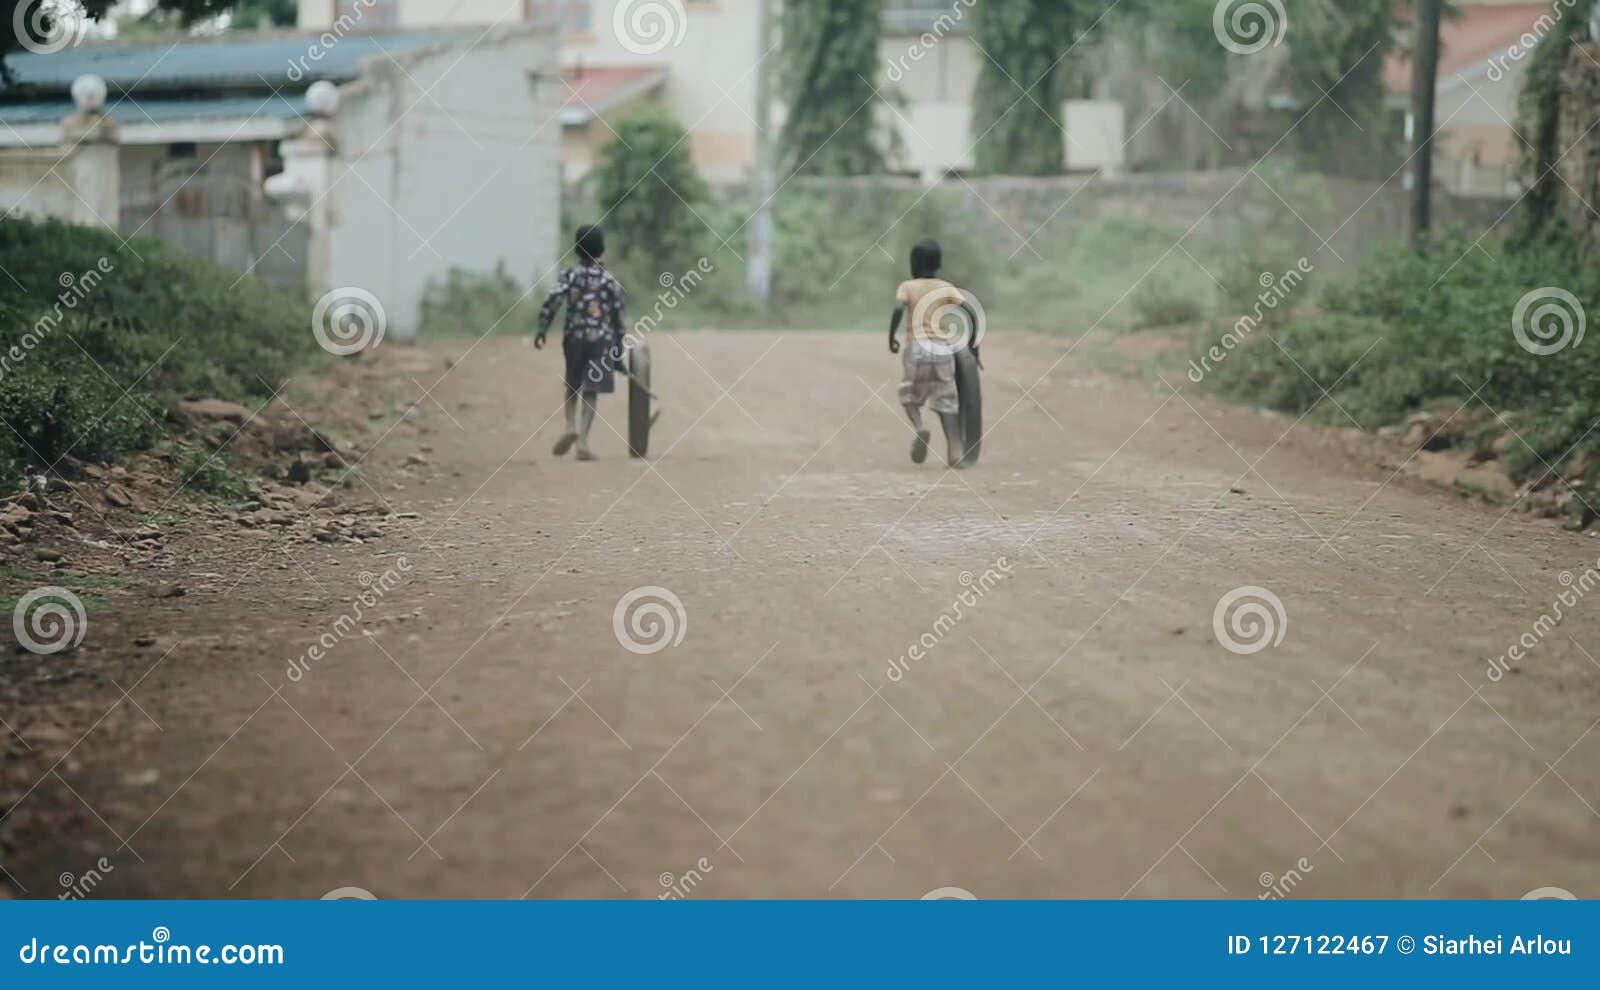 Kisumu Kenya May 17 2018 Back View Of Two African Boys Running